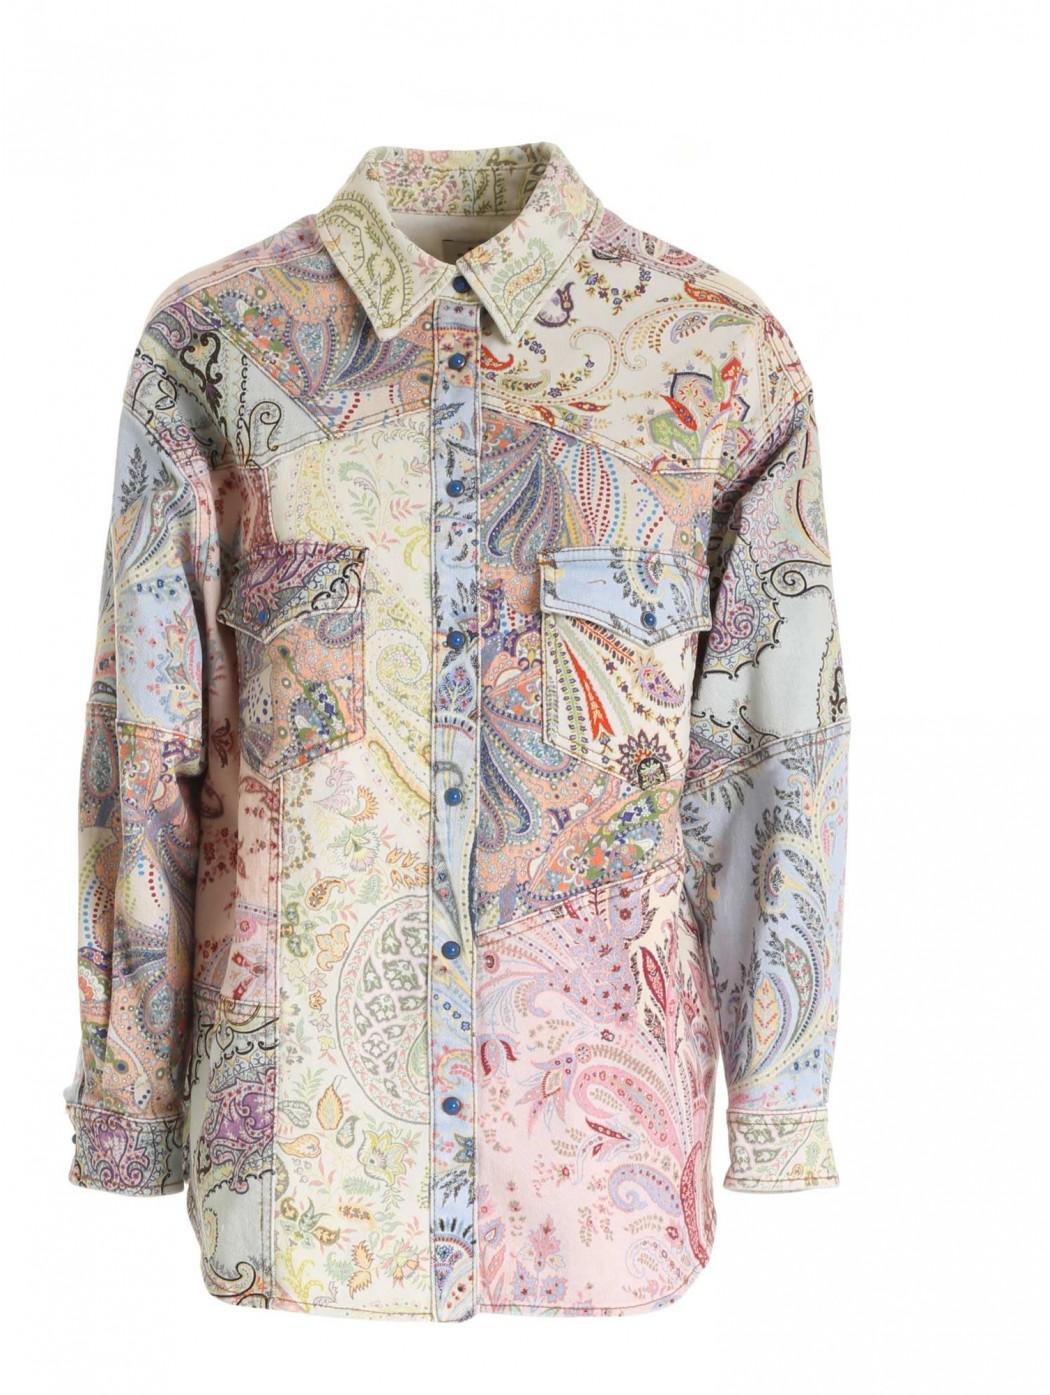 Giacca multicolor con stampa paisley ETRO DONNA 144649460 8000